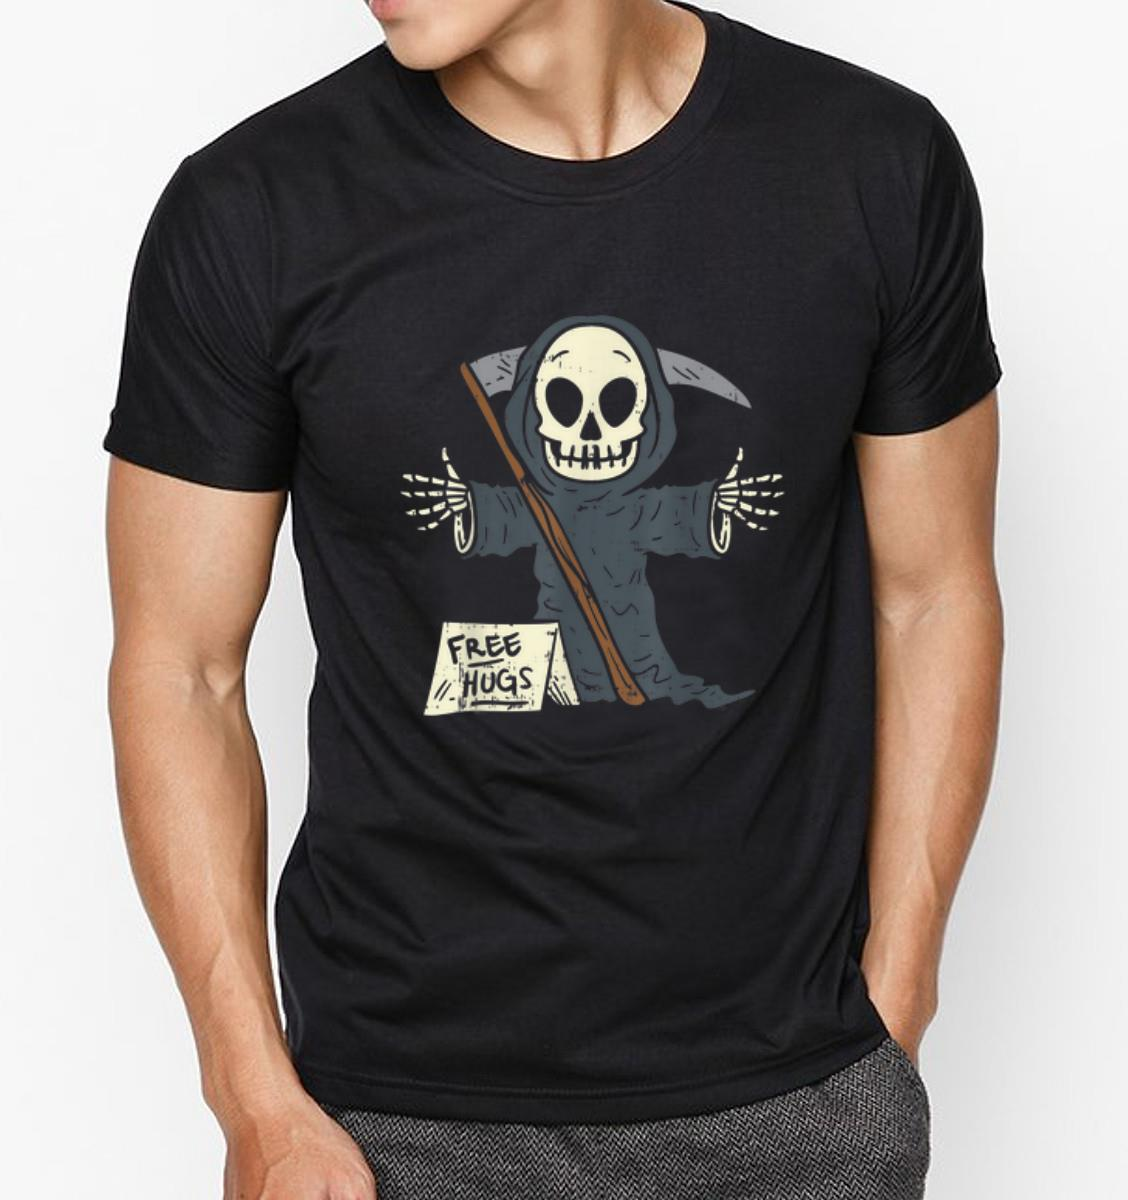 Grim Reaper Halloween Costume Design 100/% Cotton T Shirt